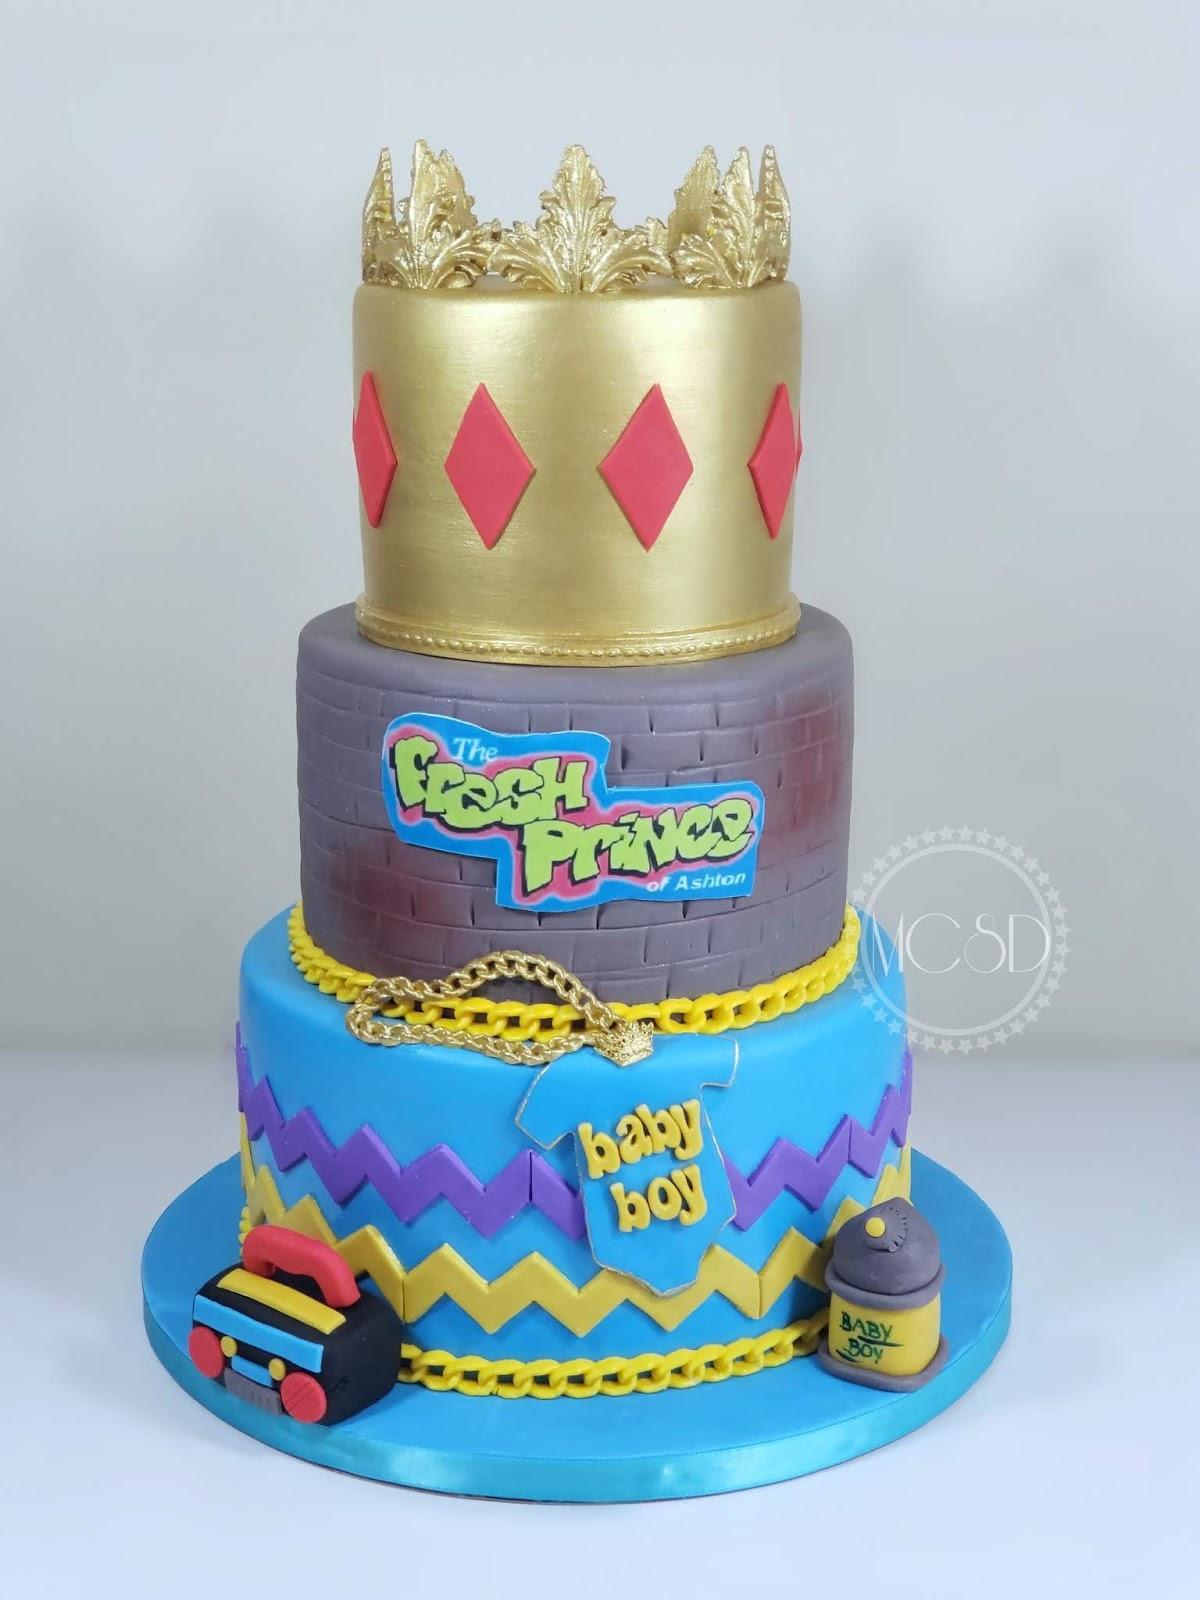 MyCakeSweetDreams: Baby Shower Cake Fresh Prince